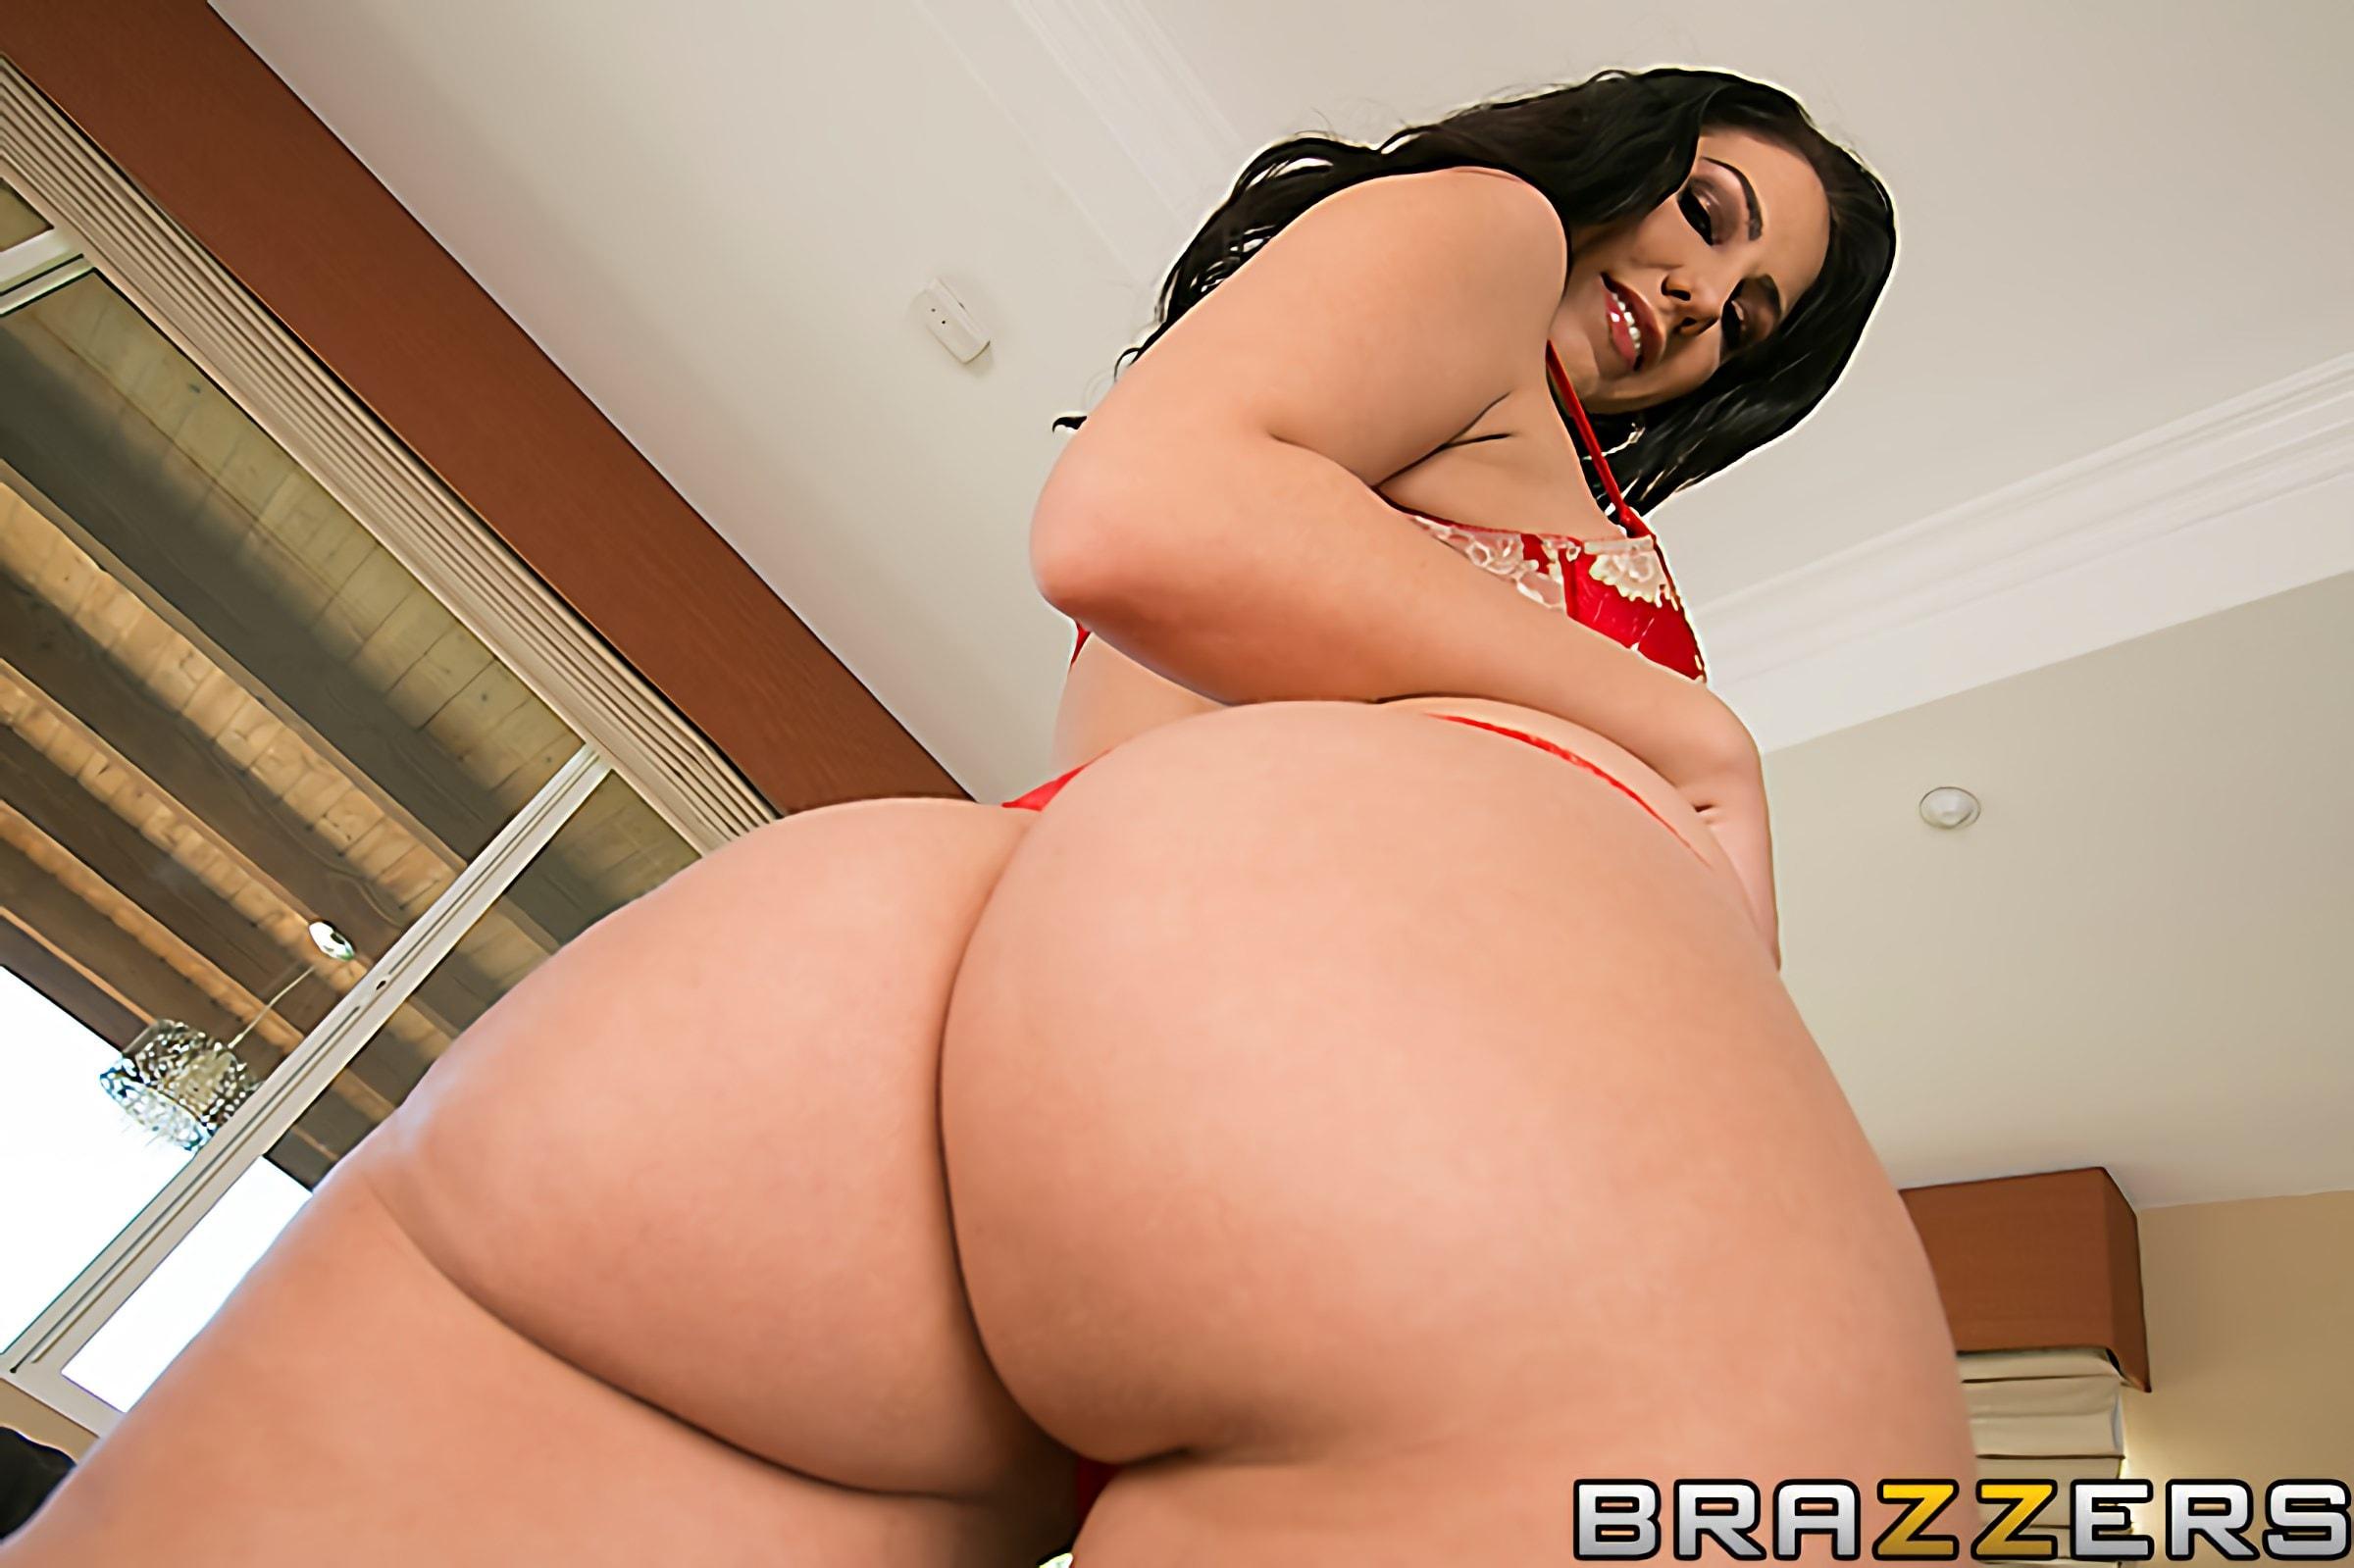 Brazzers 'Jealous Asshole' starring Madison Rose (Photo 11)